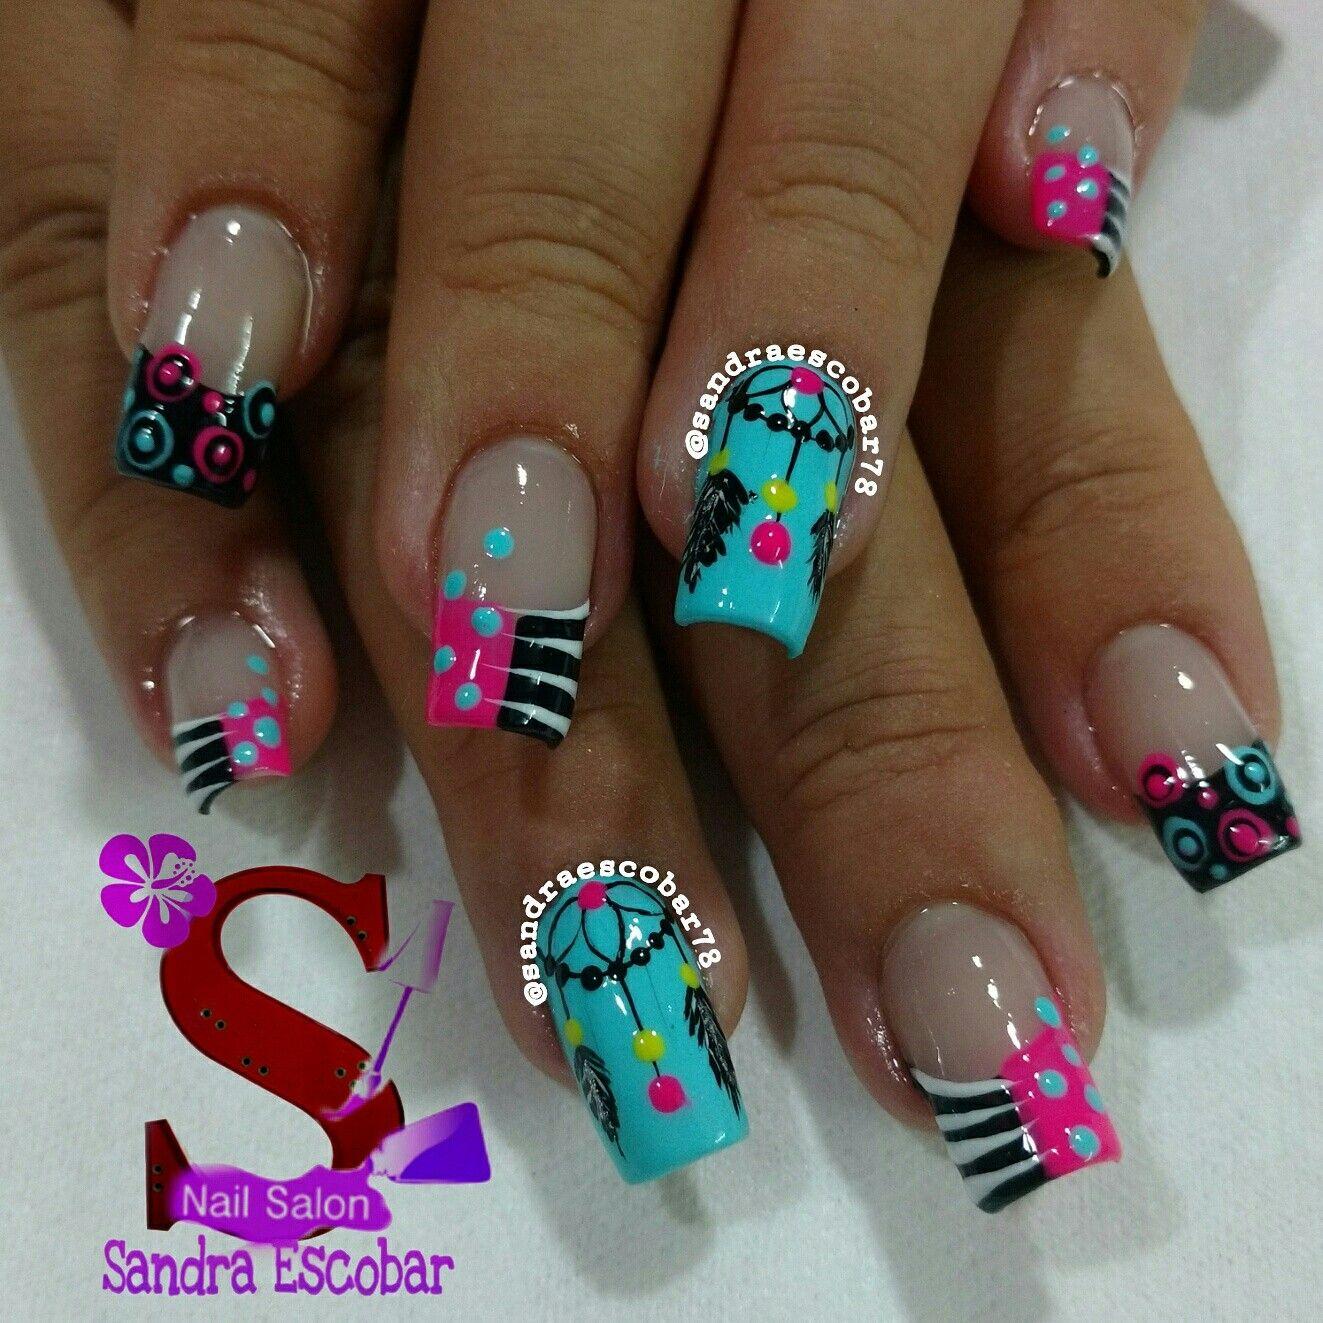 Plumas | manicure | Pinterest | Pluma, Diseños de uñas y Manicuras